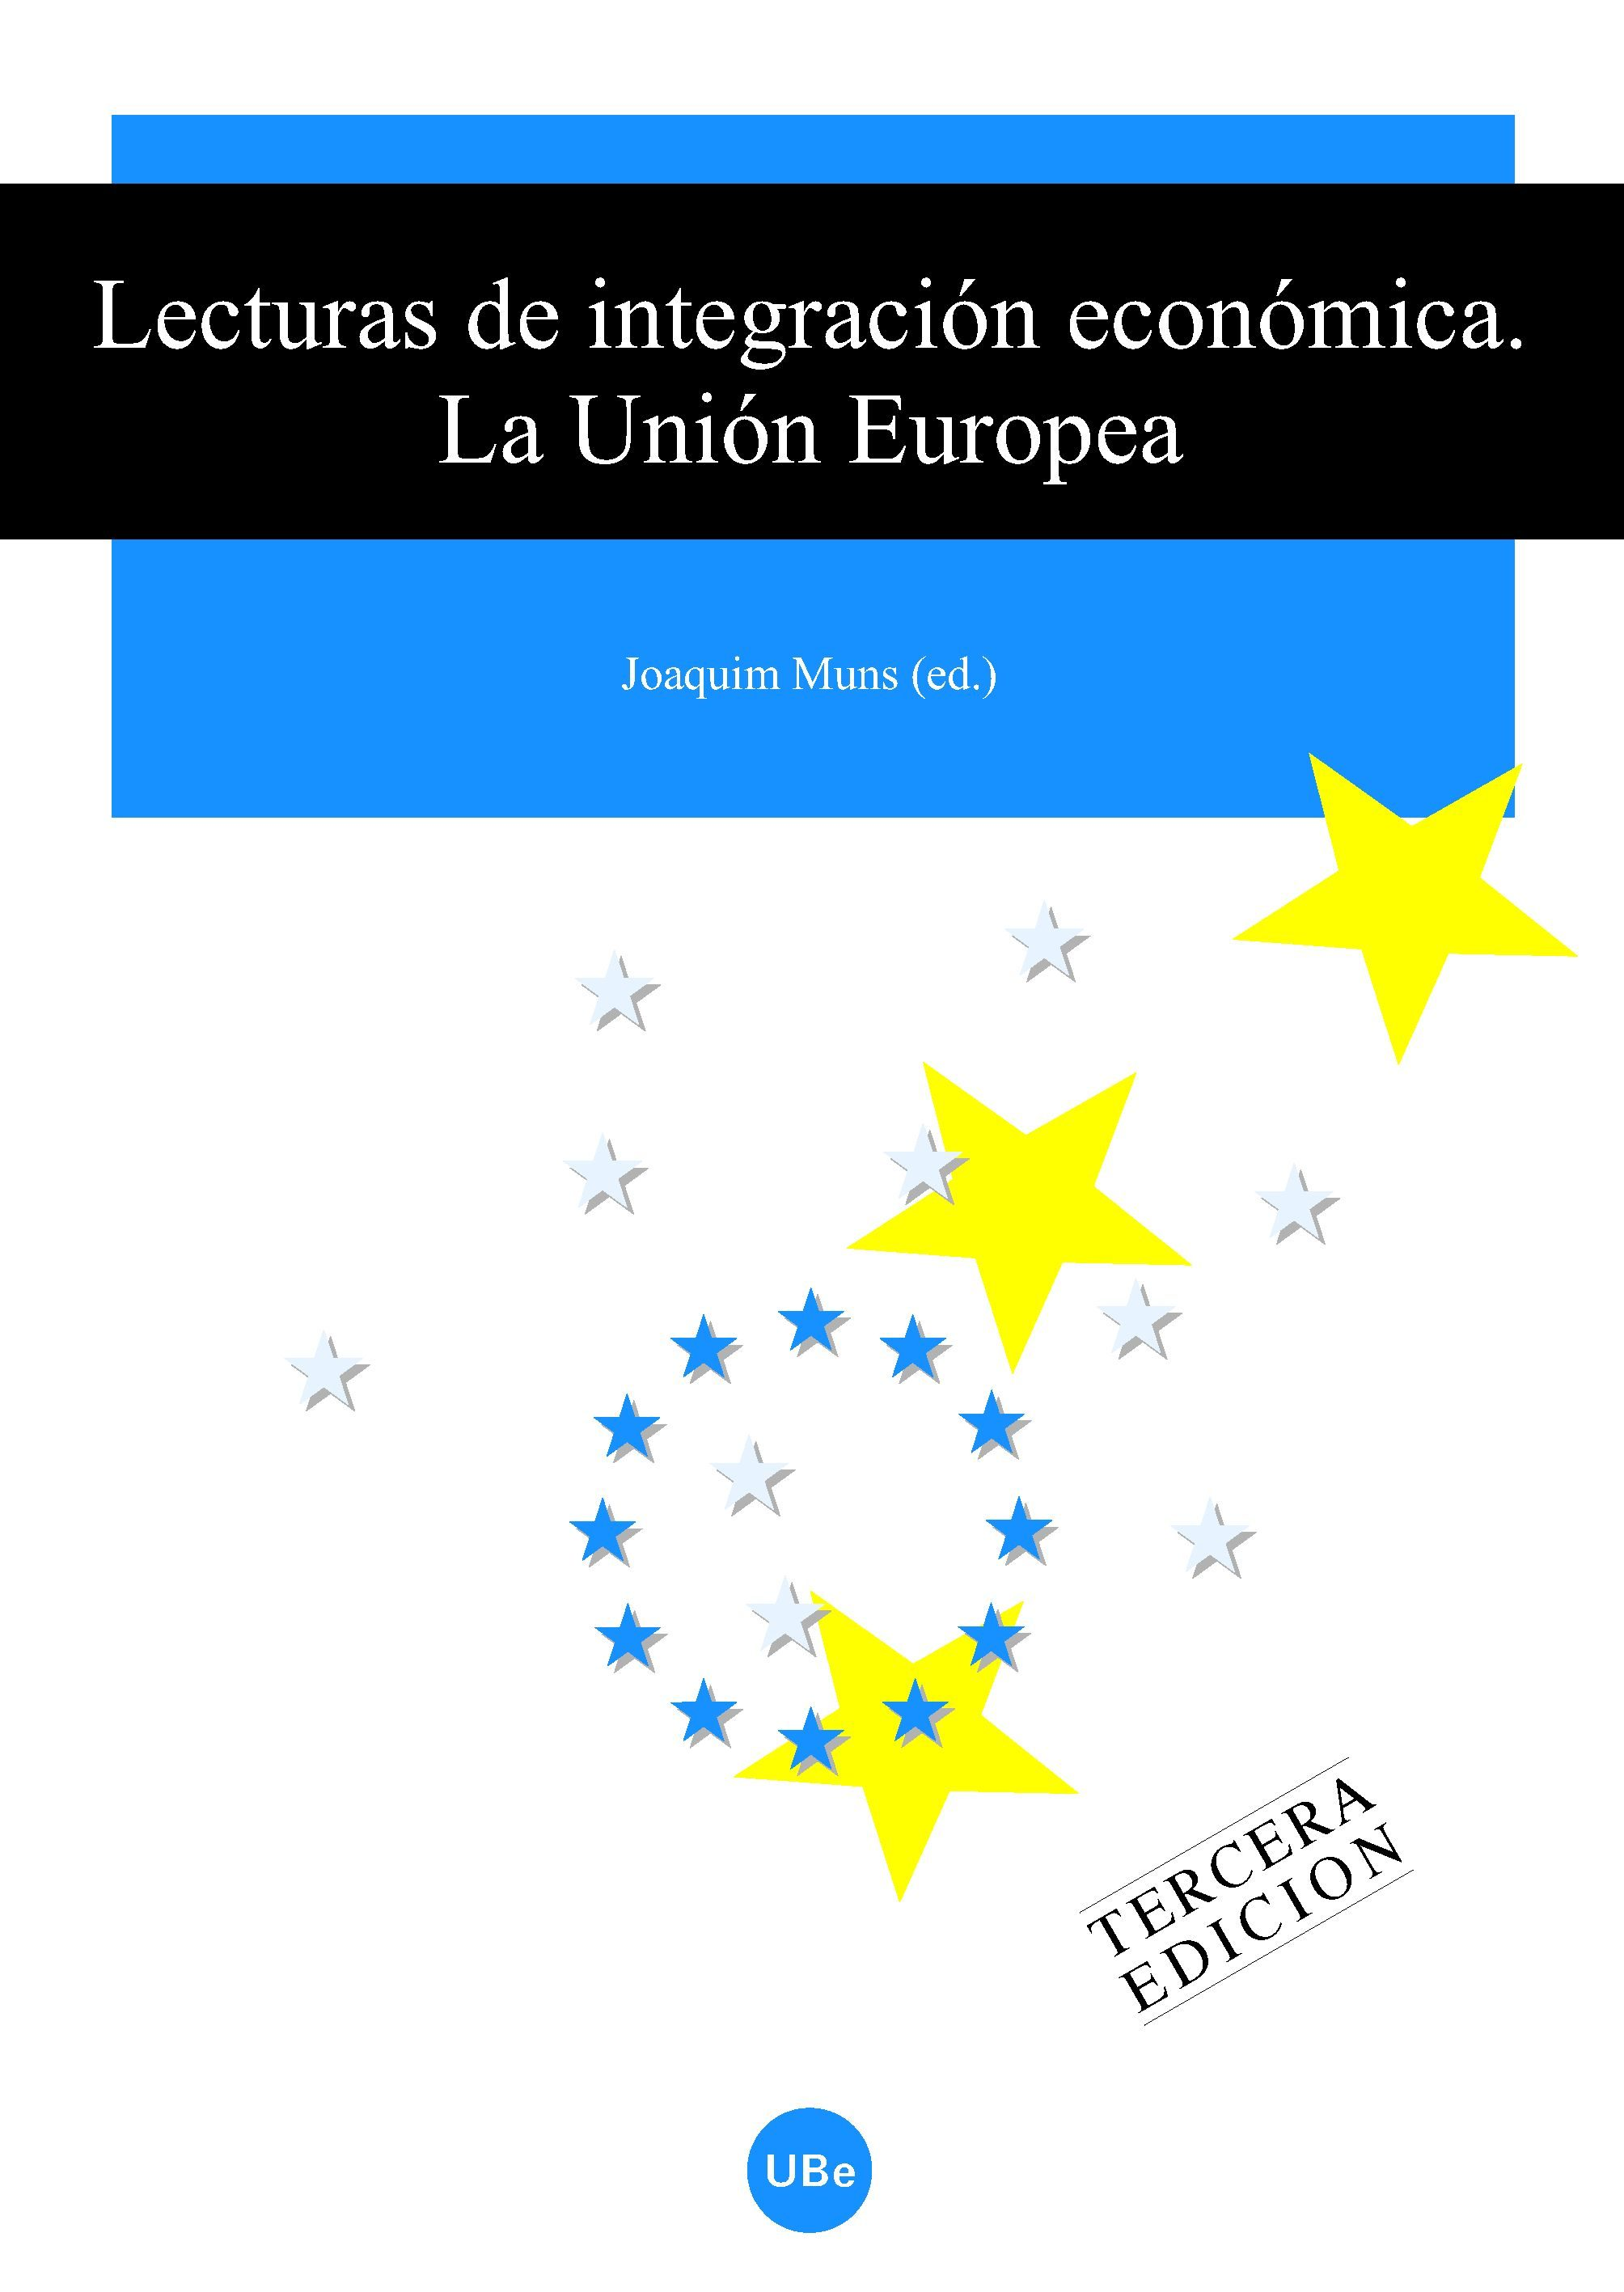 Lecturas De Integracion Economica: La Union Europea por Joaquim (ed.) Muns epub